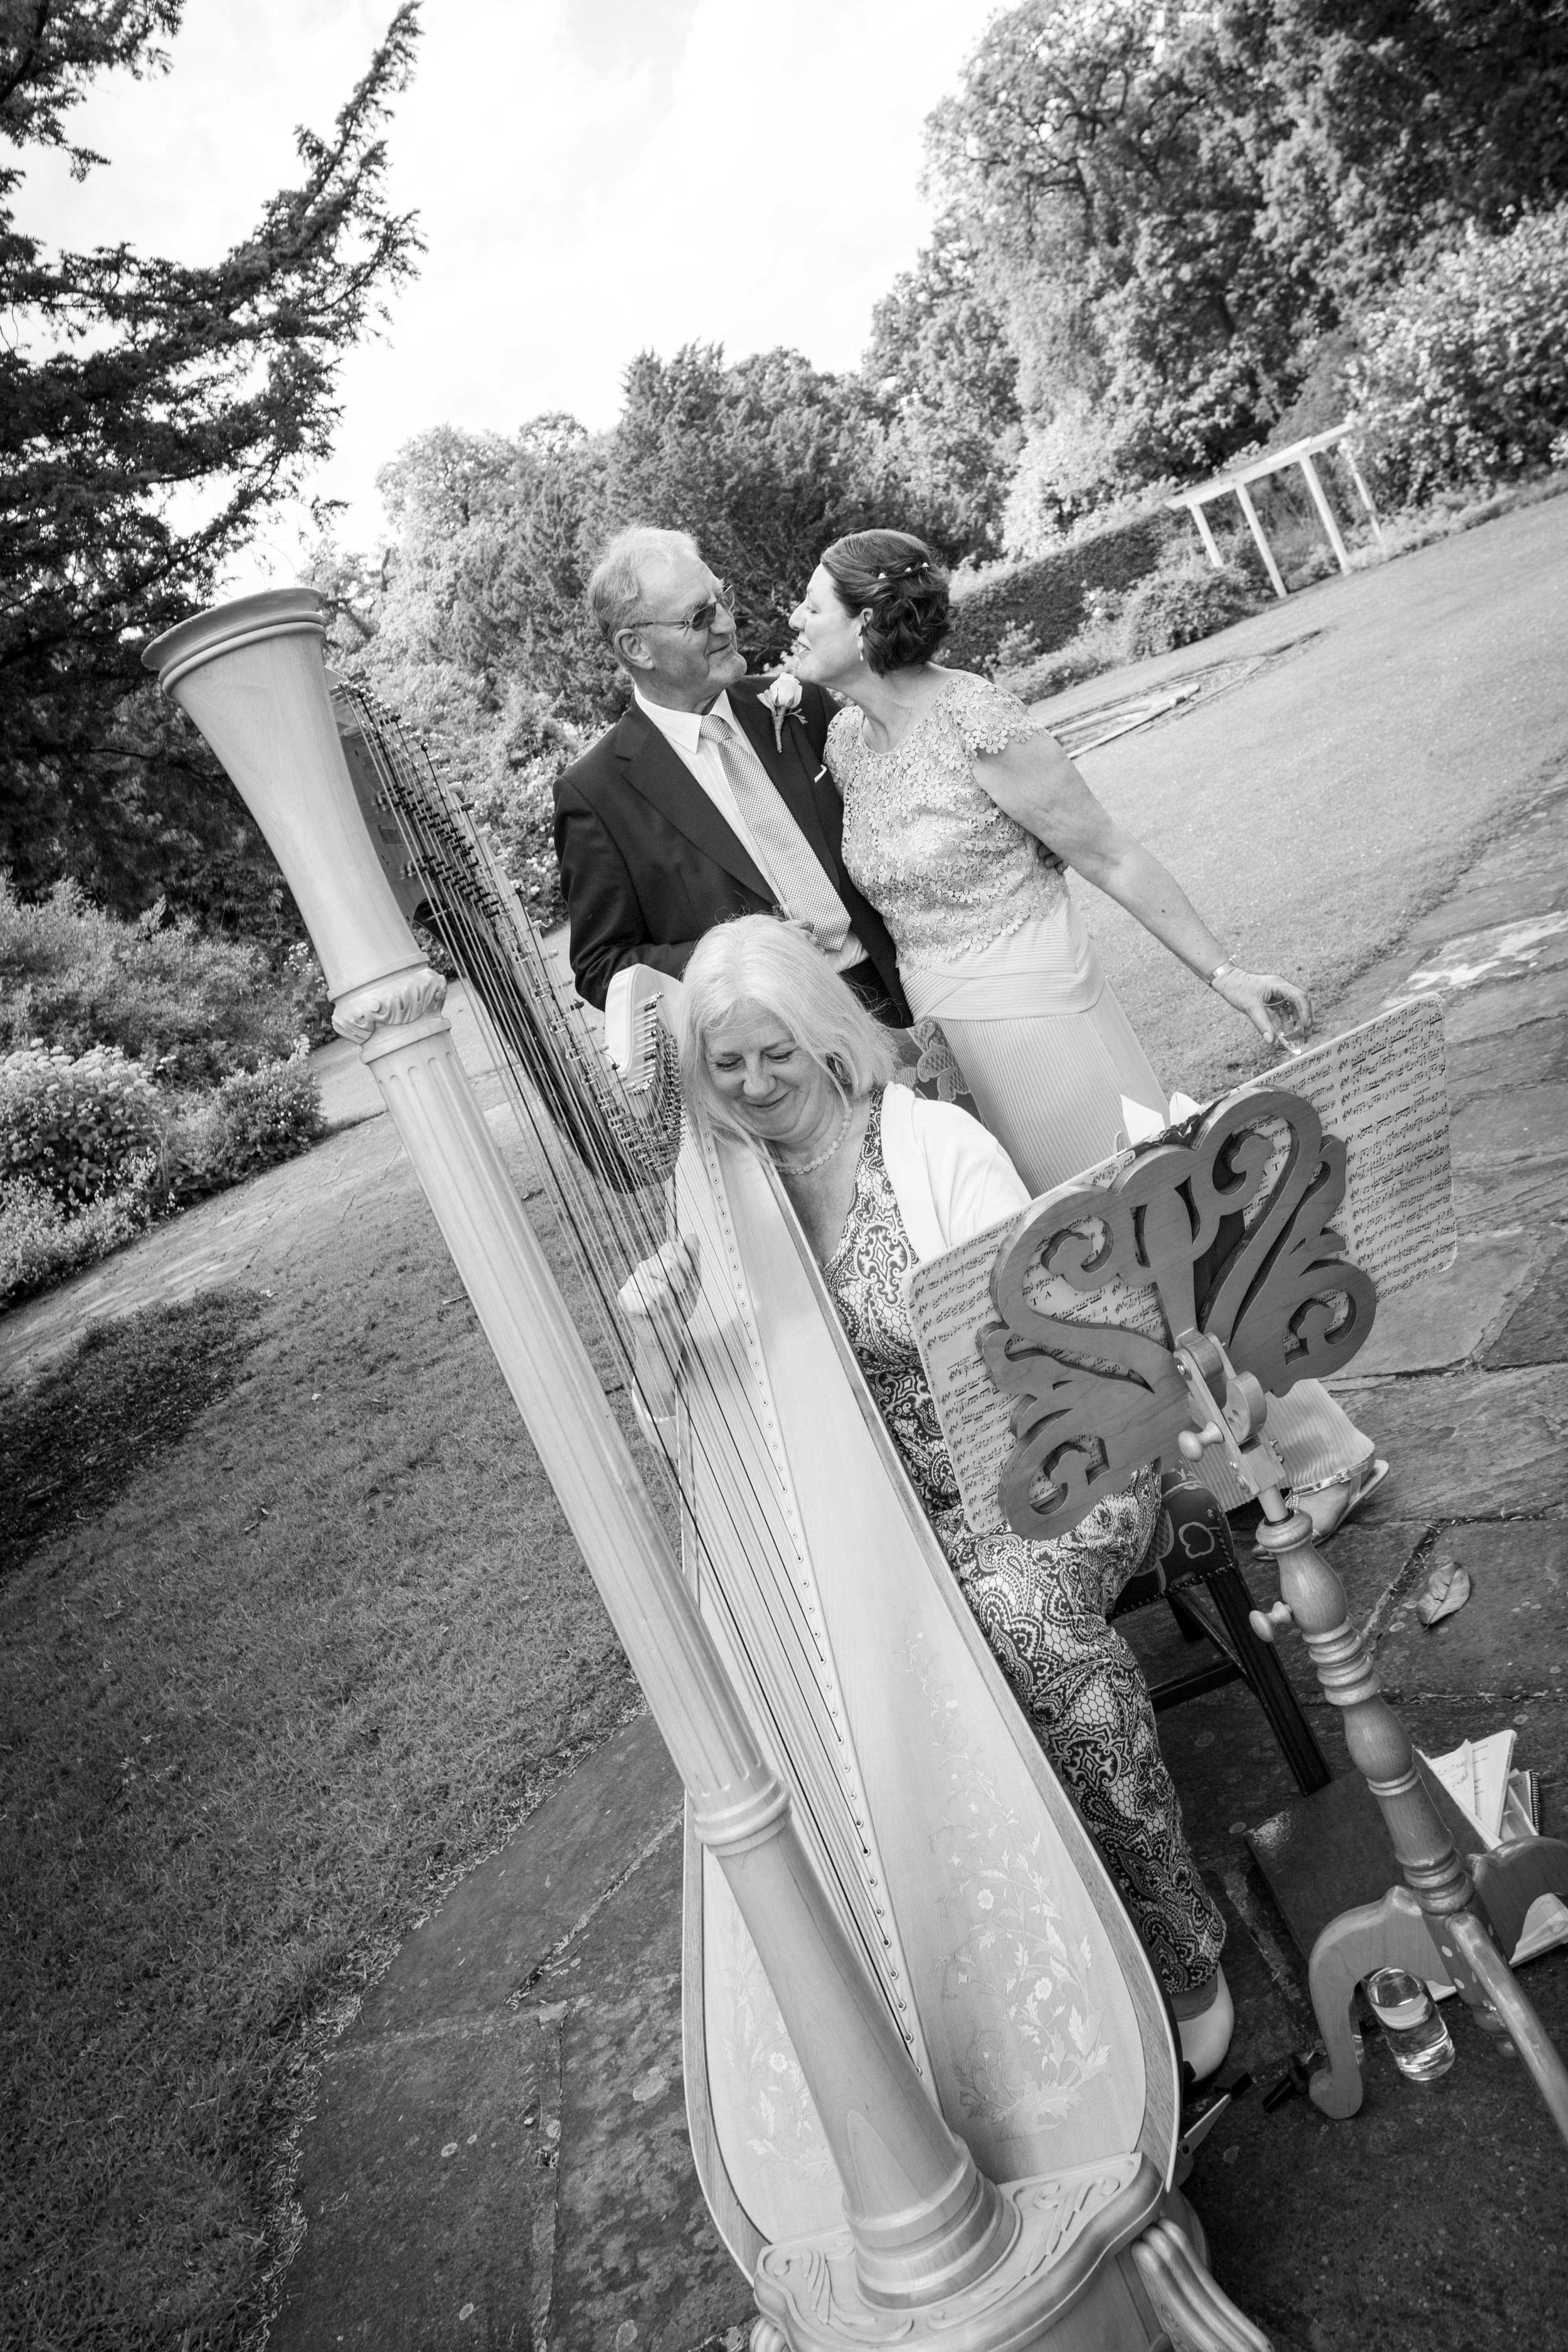 Sue and Stuart at Stapleford Park - Photographer www.markpugh.com